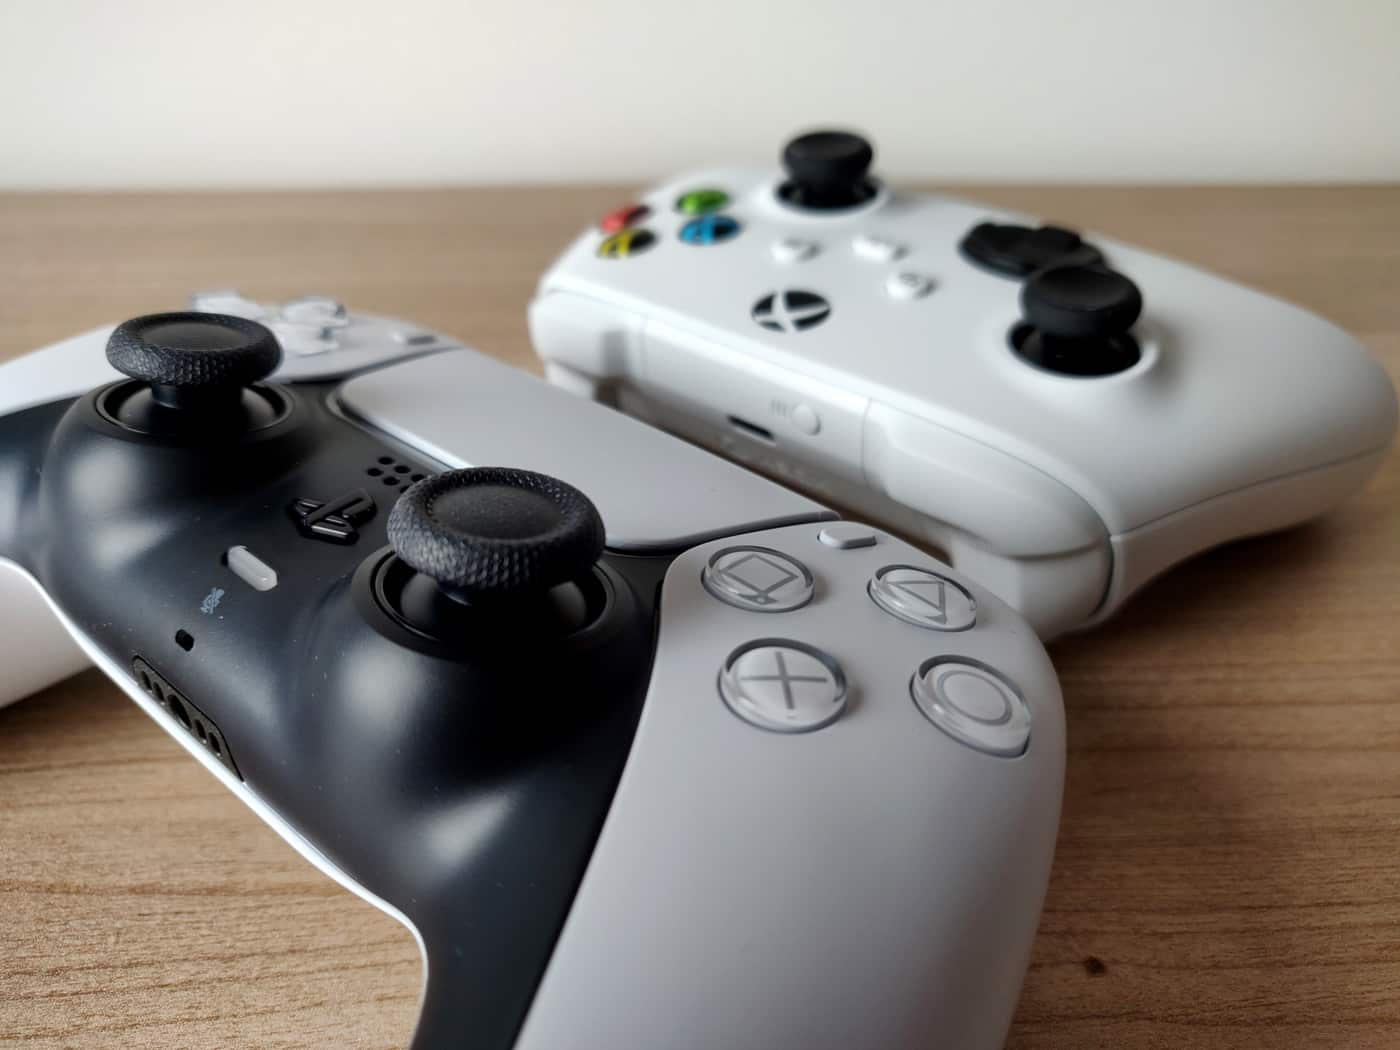 PS5 Digital Xbox Series S